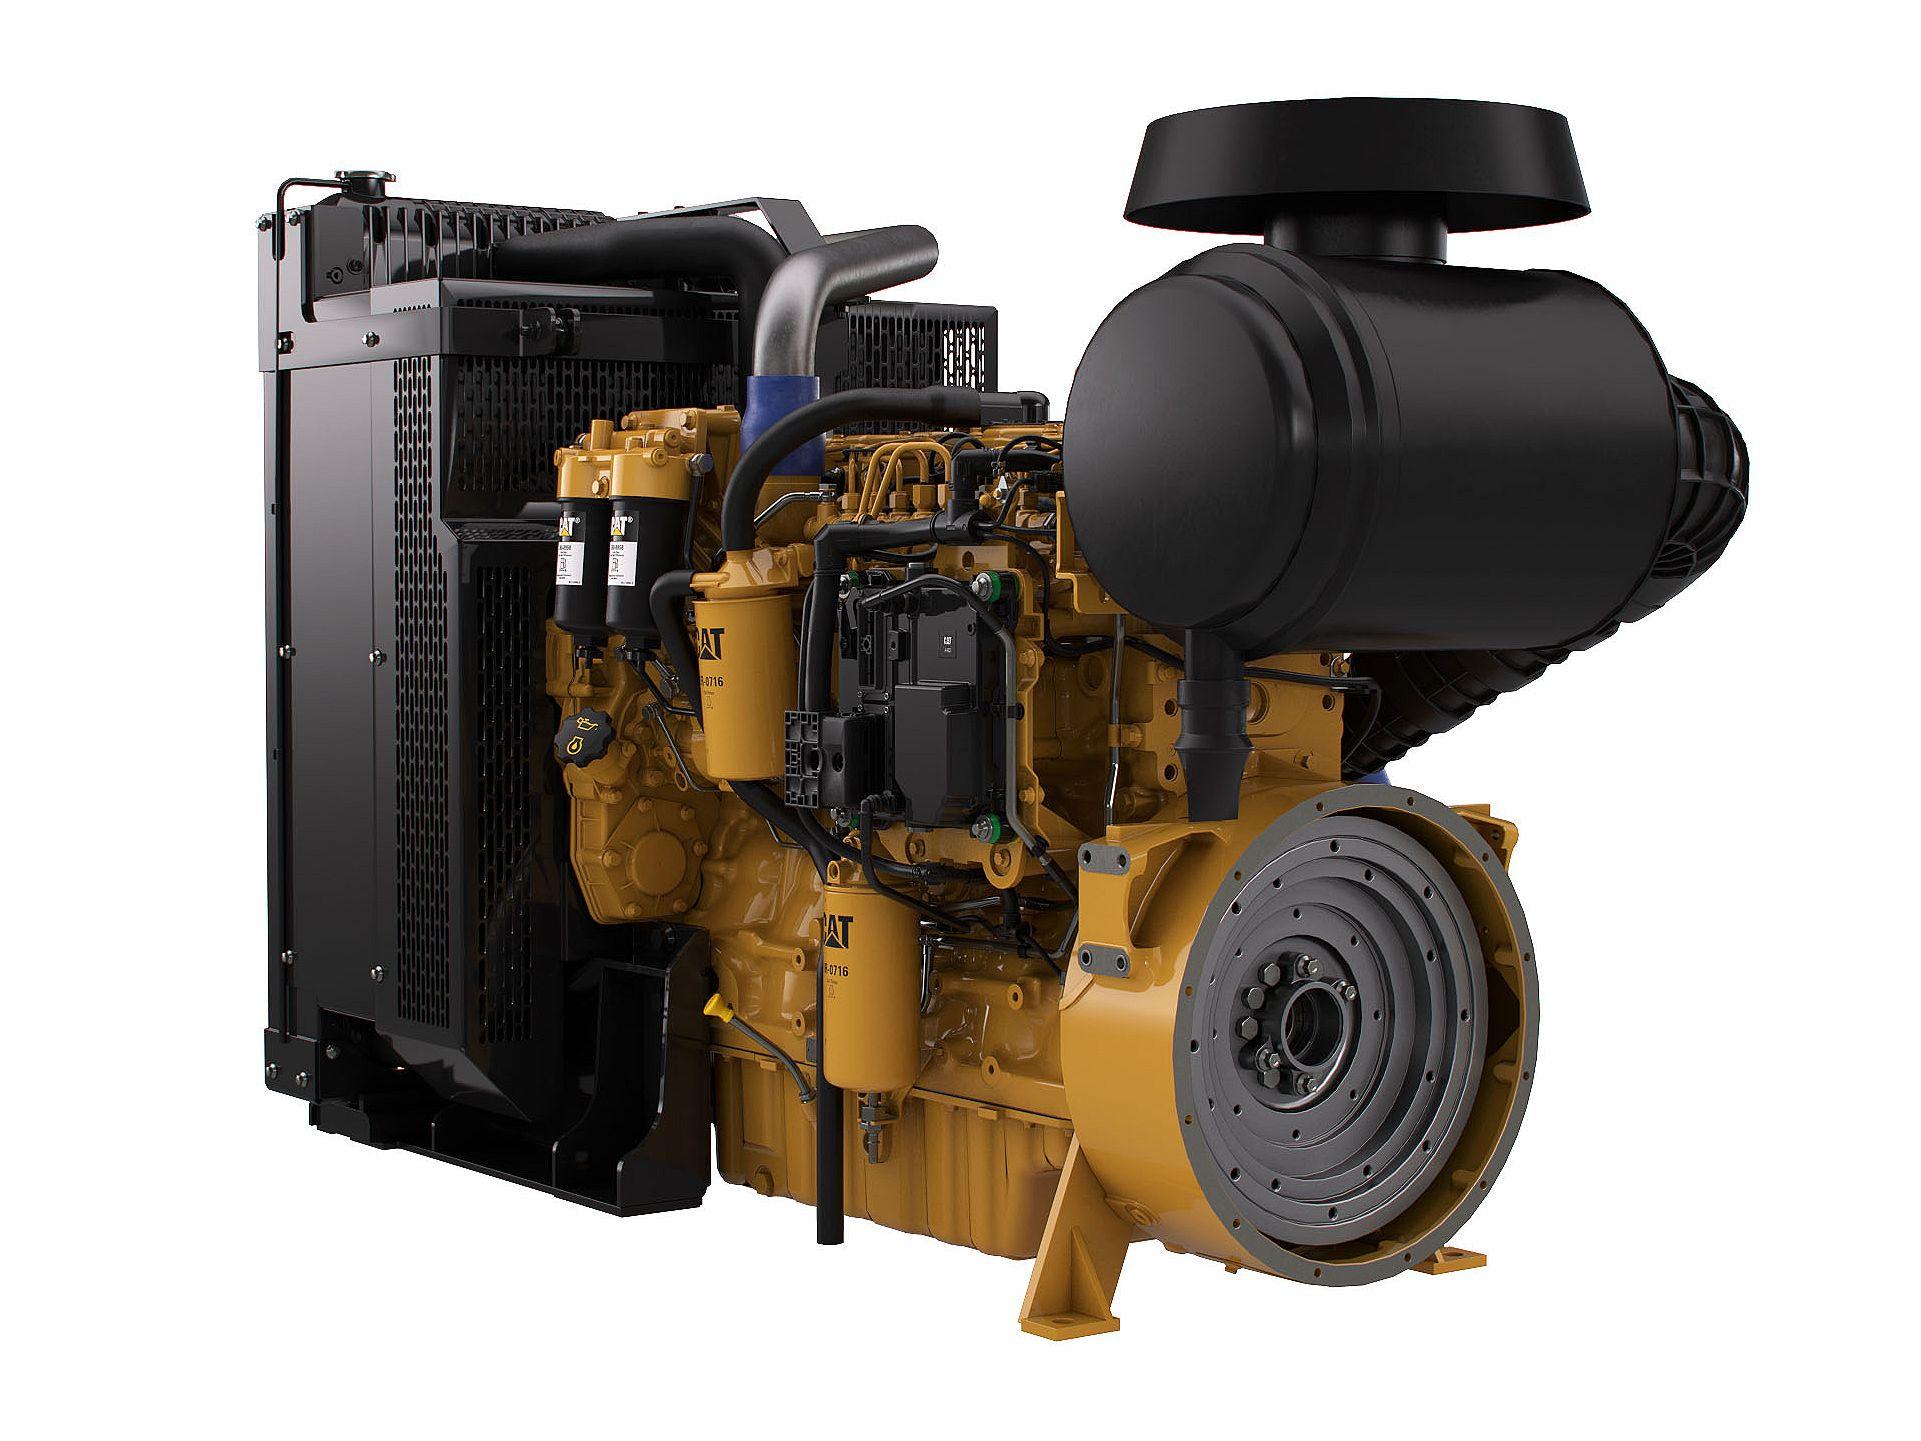 C7.1 Industrial Power Unit